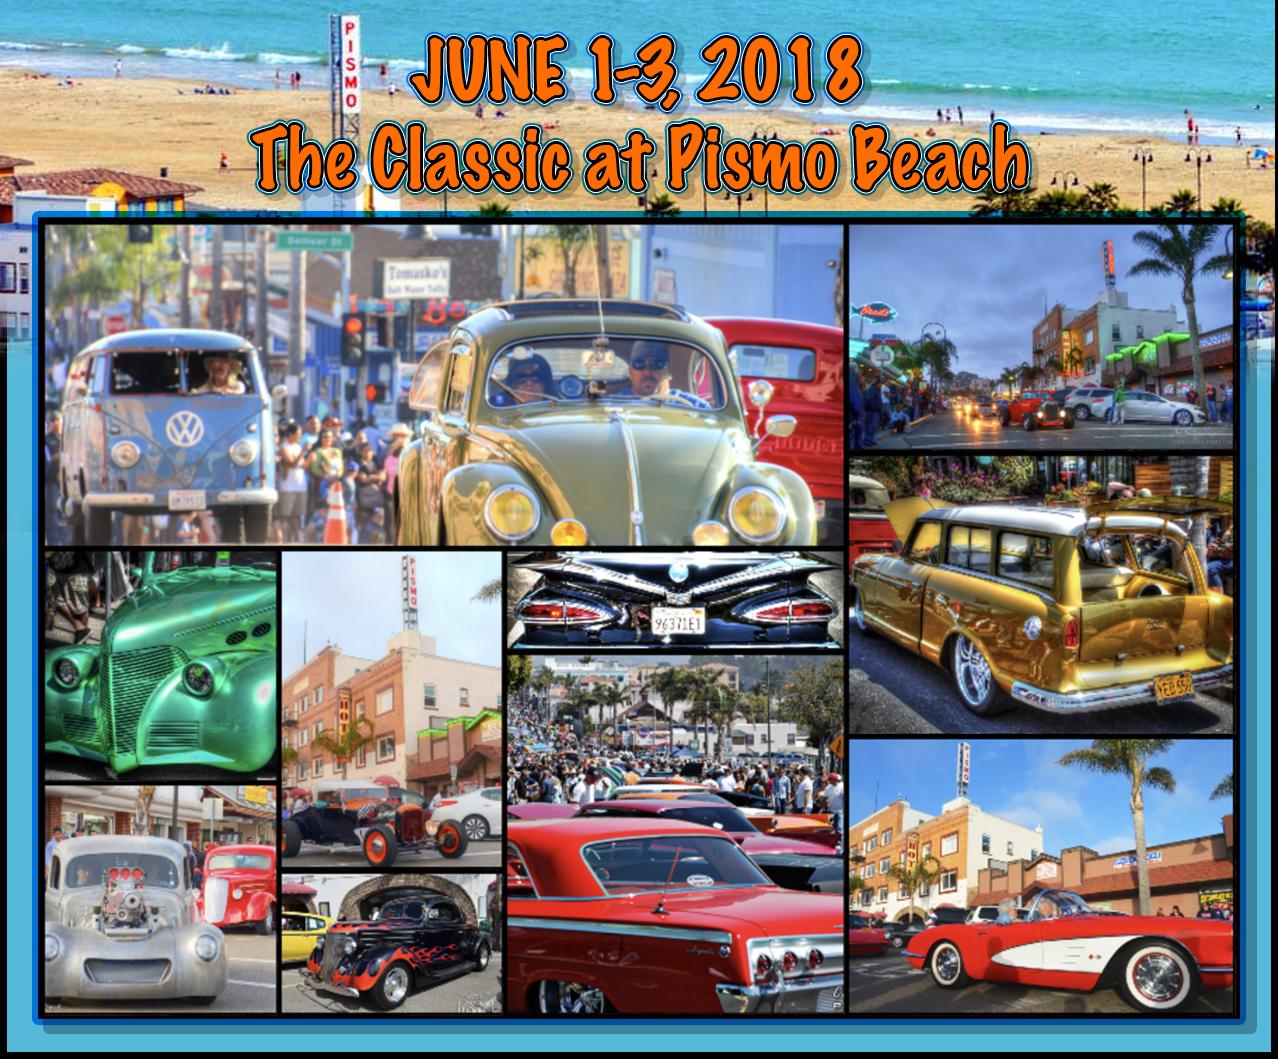 Harrys Night Club Beach Bar Harrys Live Music Lineup Classic - Classic car show pismo beach